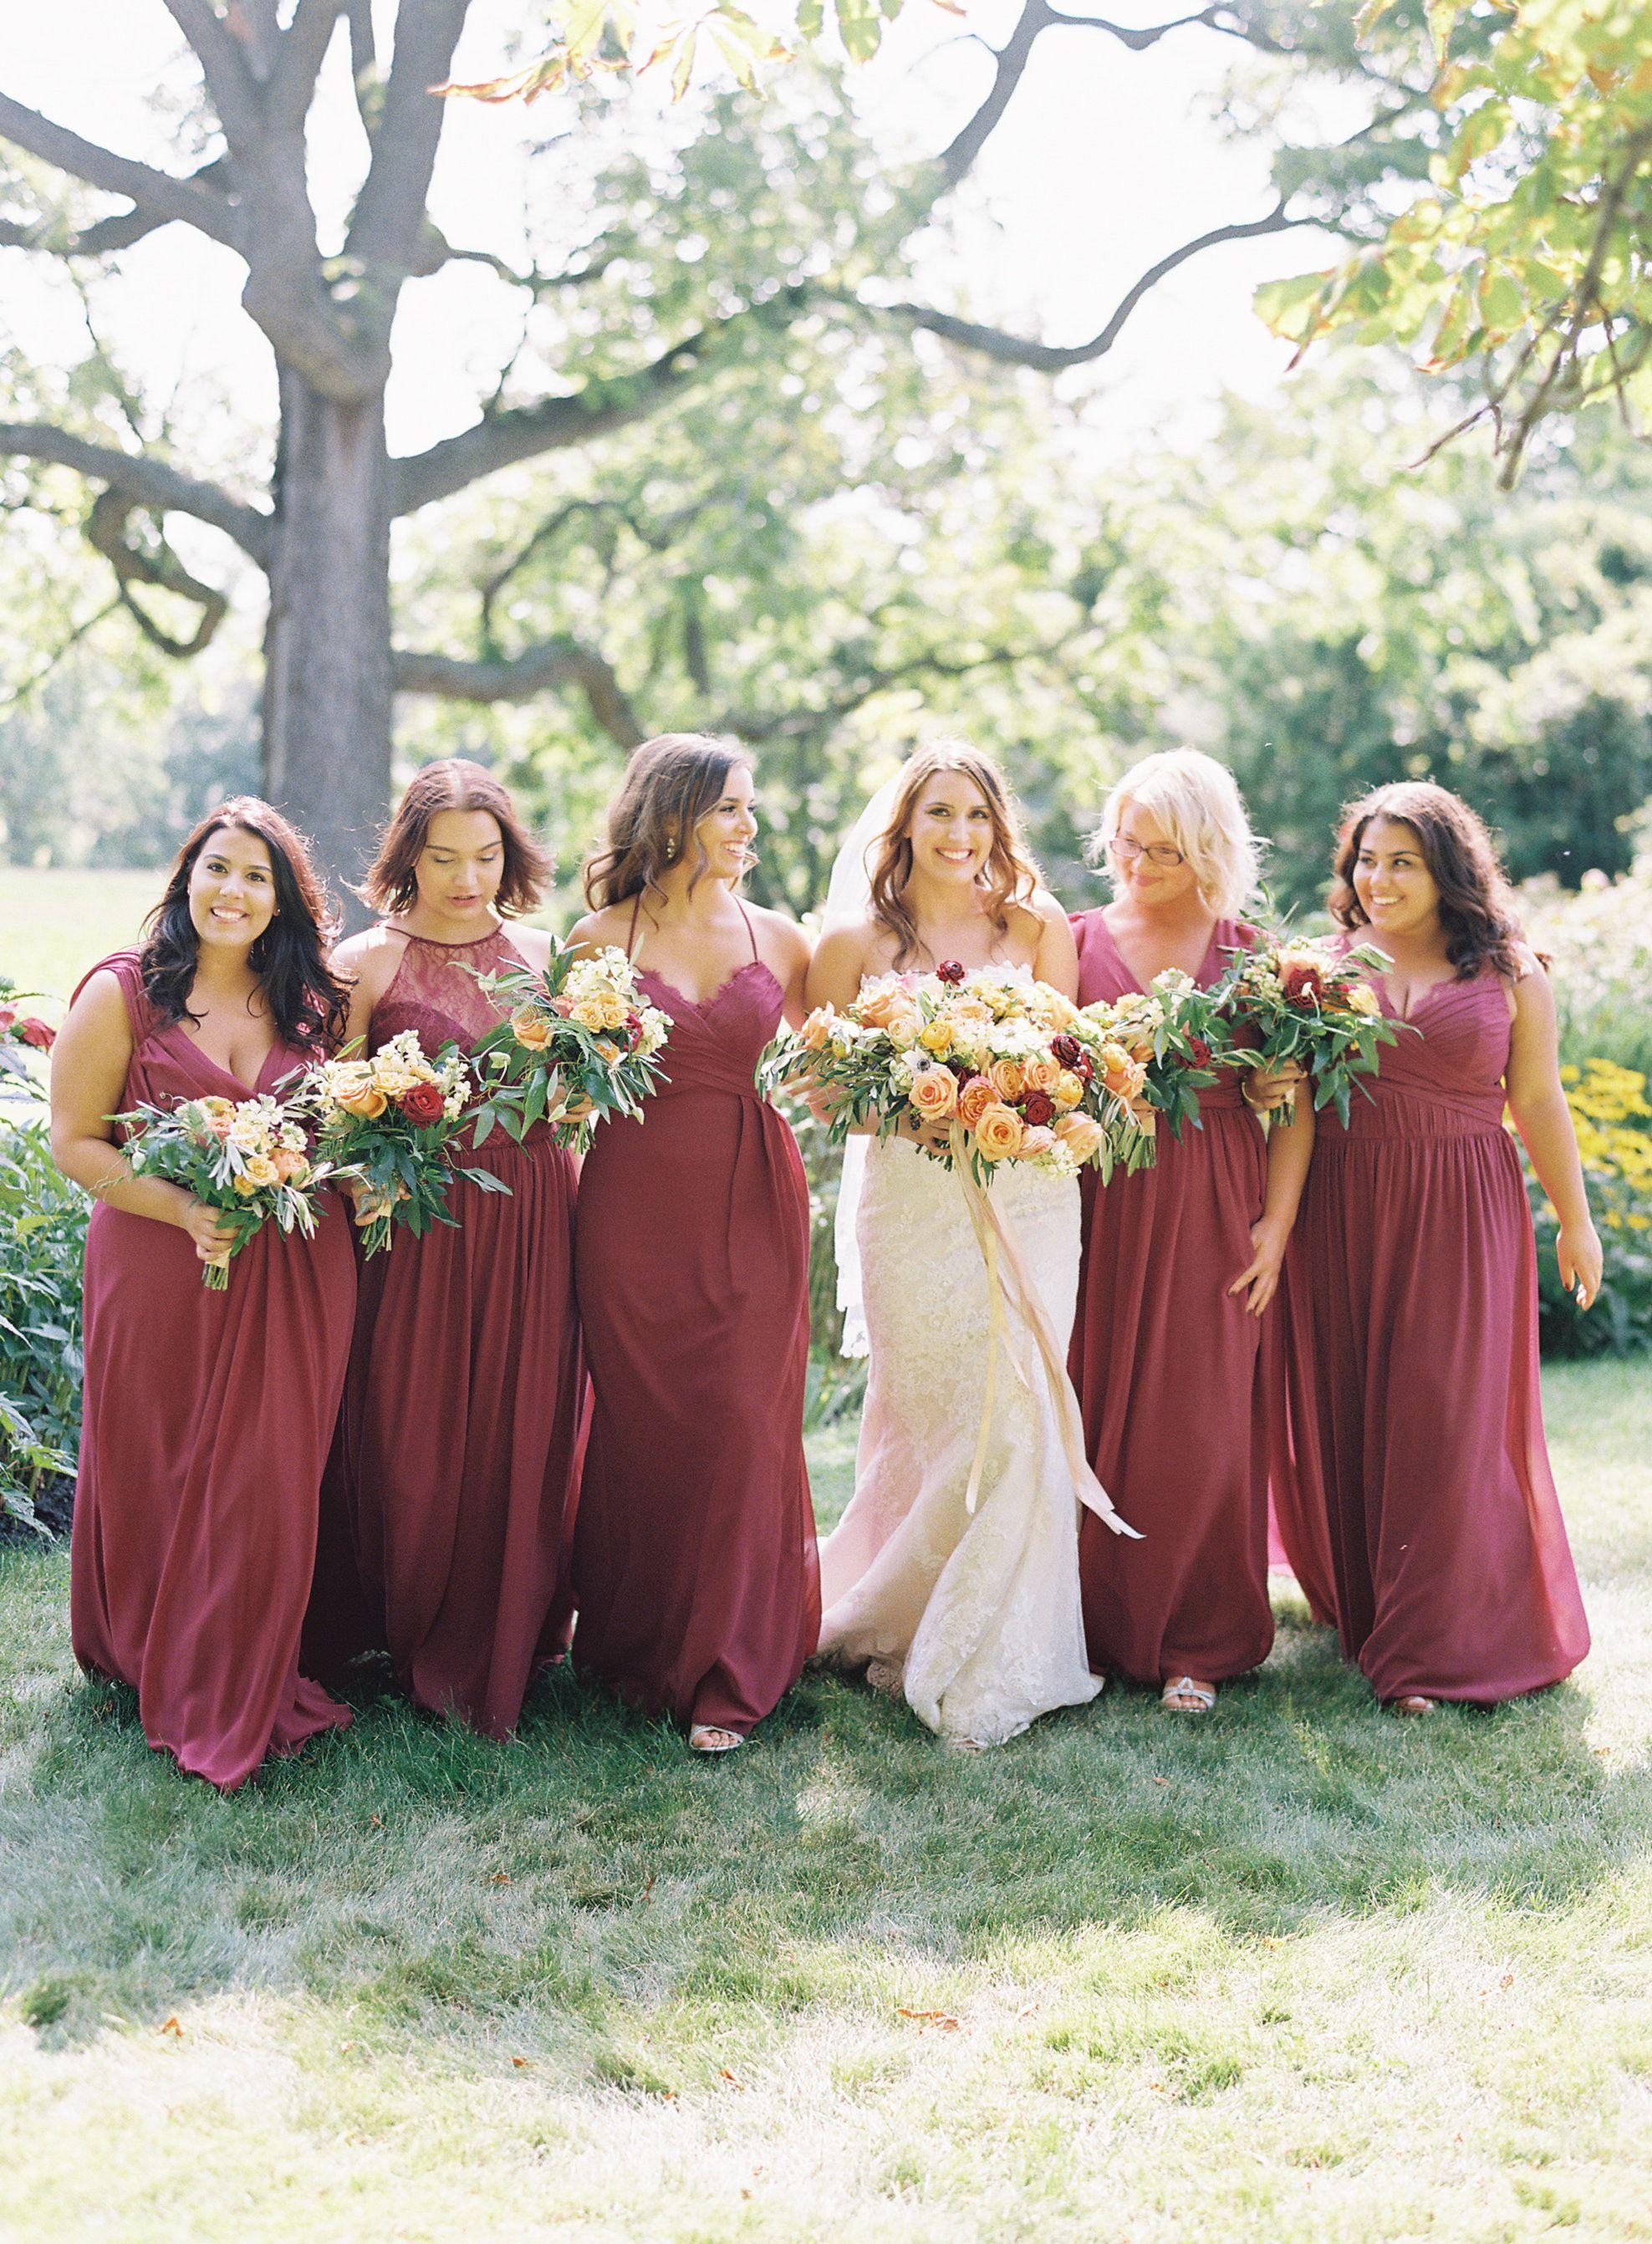 Vineyard Wedding Inspired By The Couple S Honeymoon Destination Fall Bridesmaid Dresses Autumn Wedding Dress Bridesmaid Bridesmaid Dresses Plus Size [ 2684 x 1976 Pixel ]